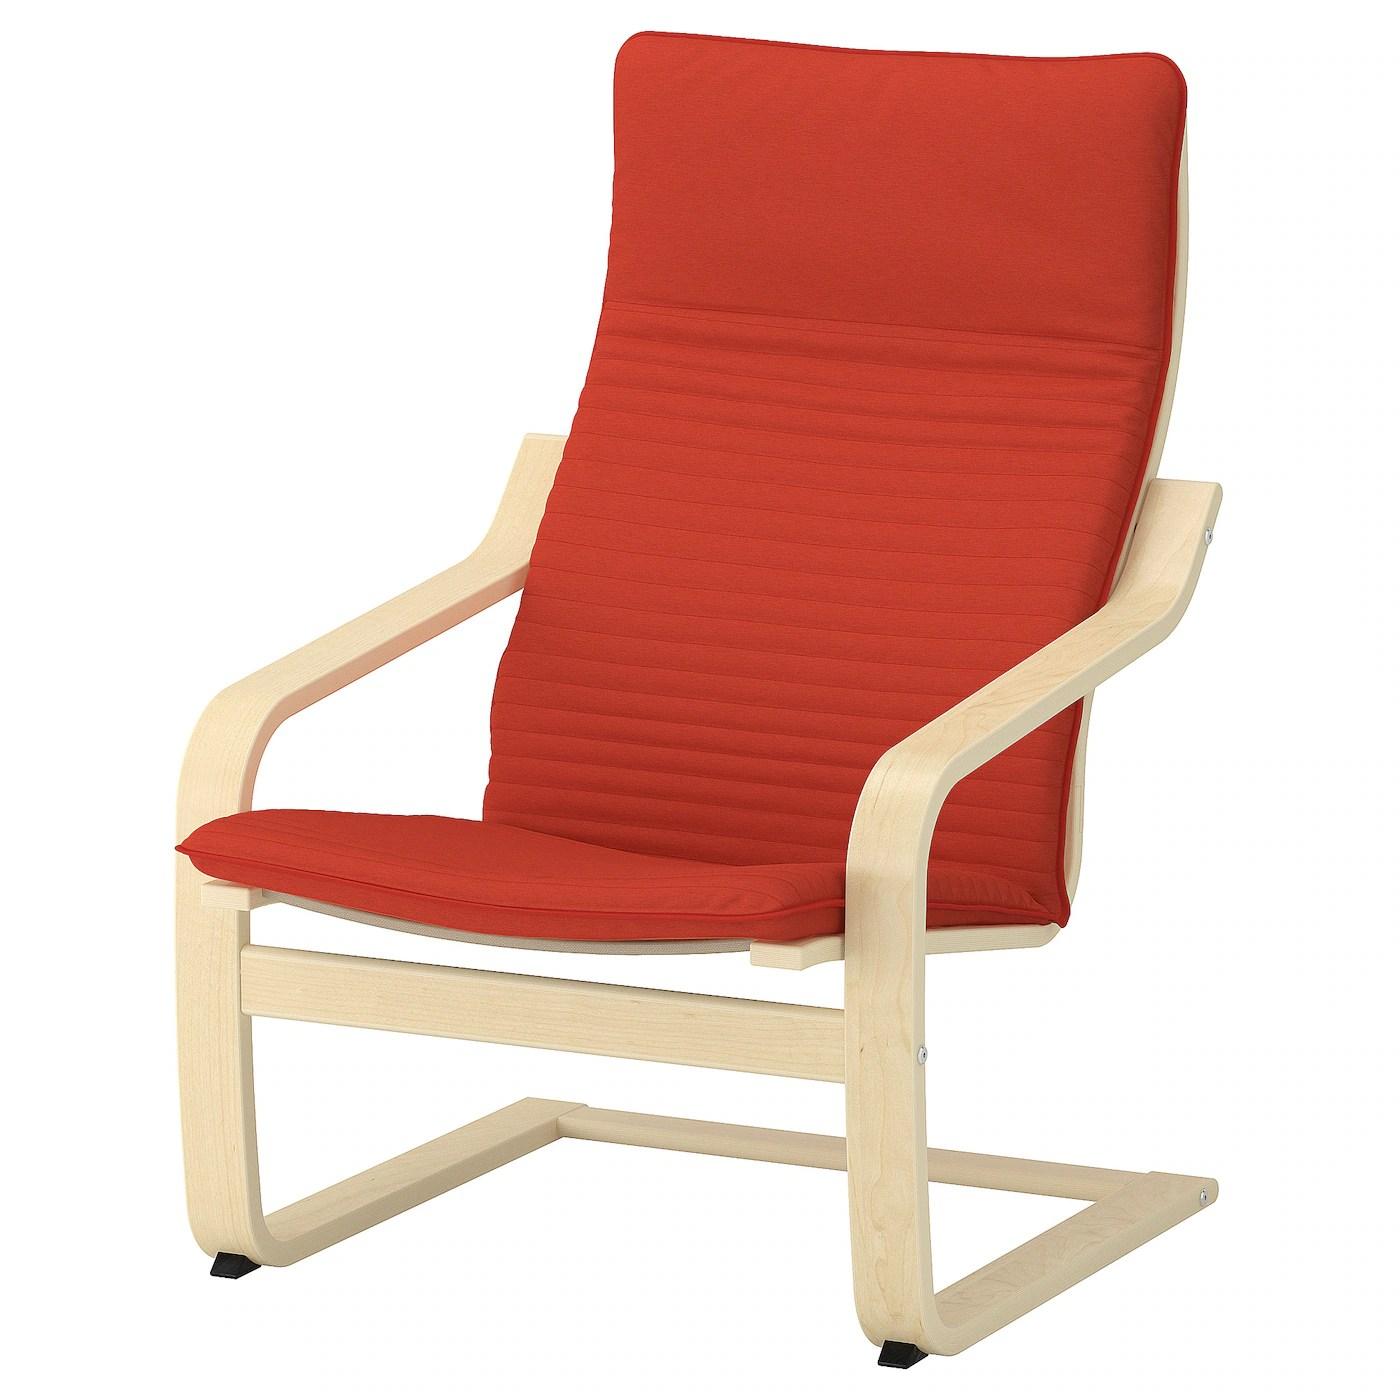 ikea orange chair covers pier one parson poÄng armchair cushion knisa red